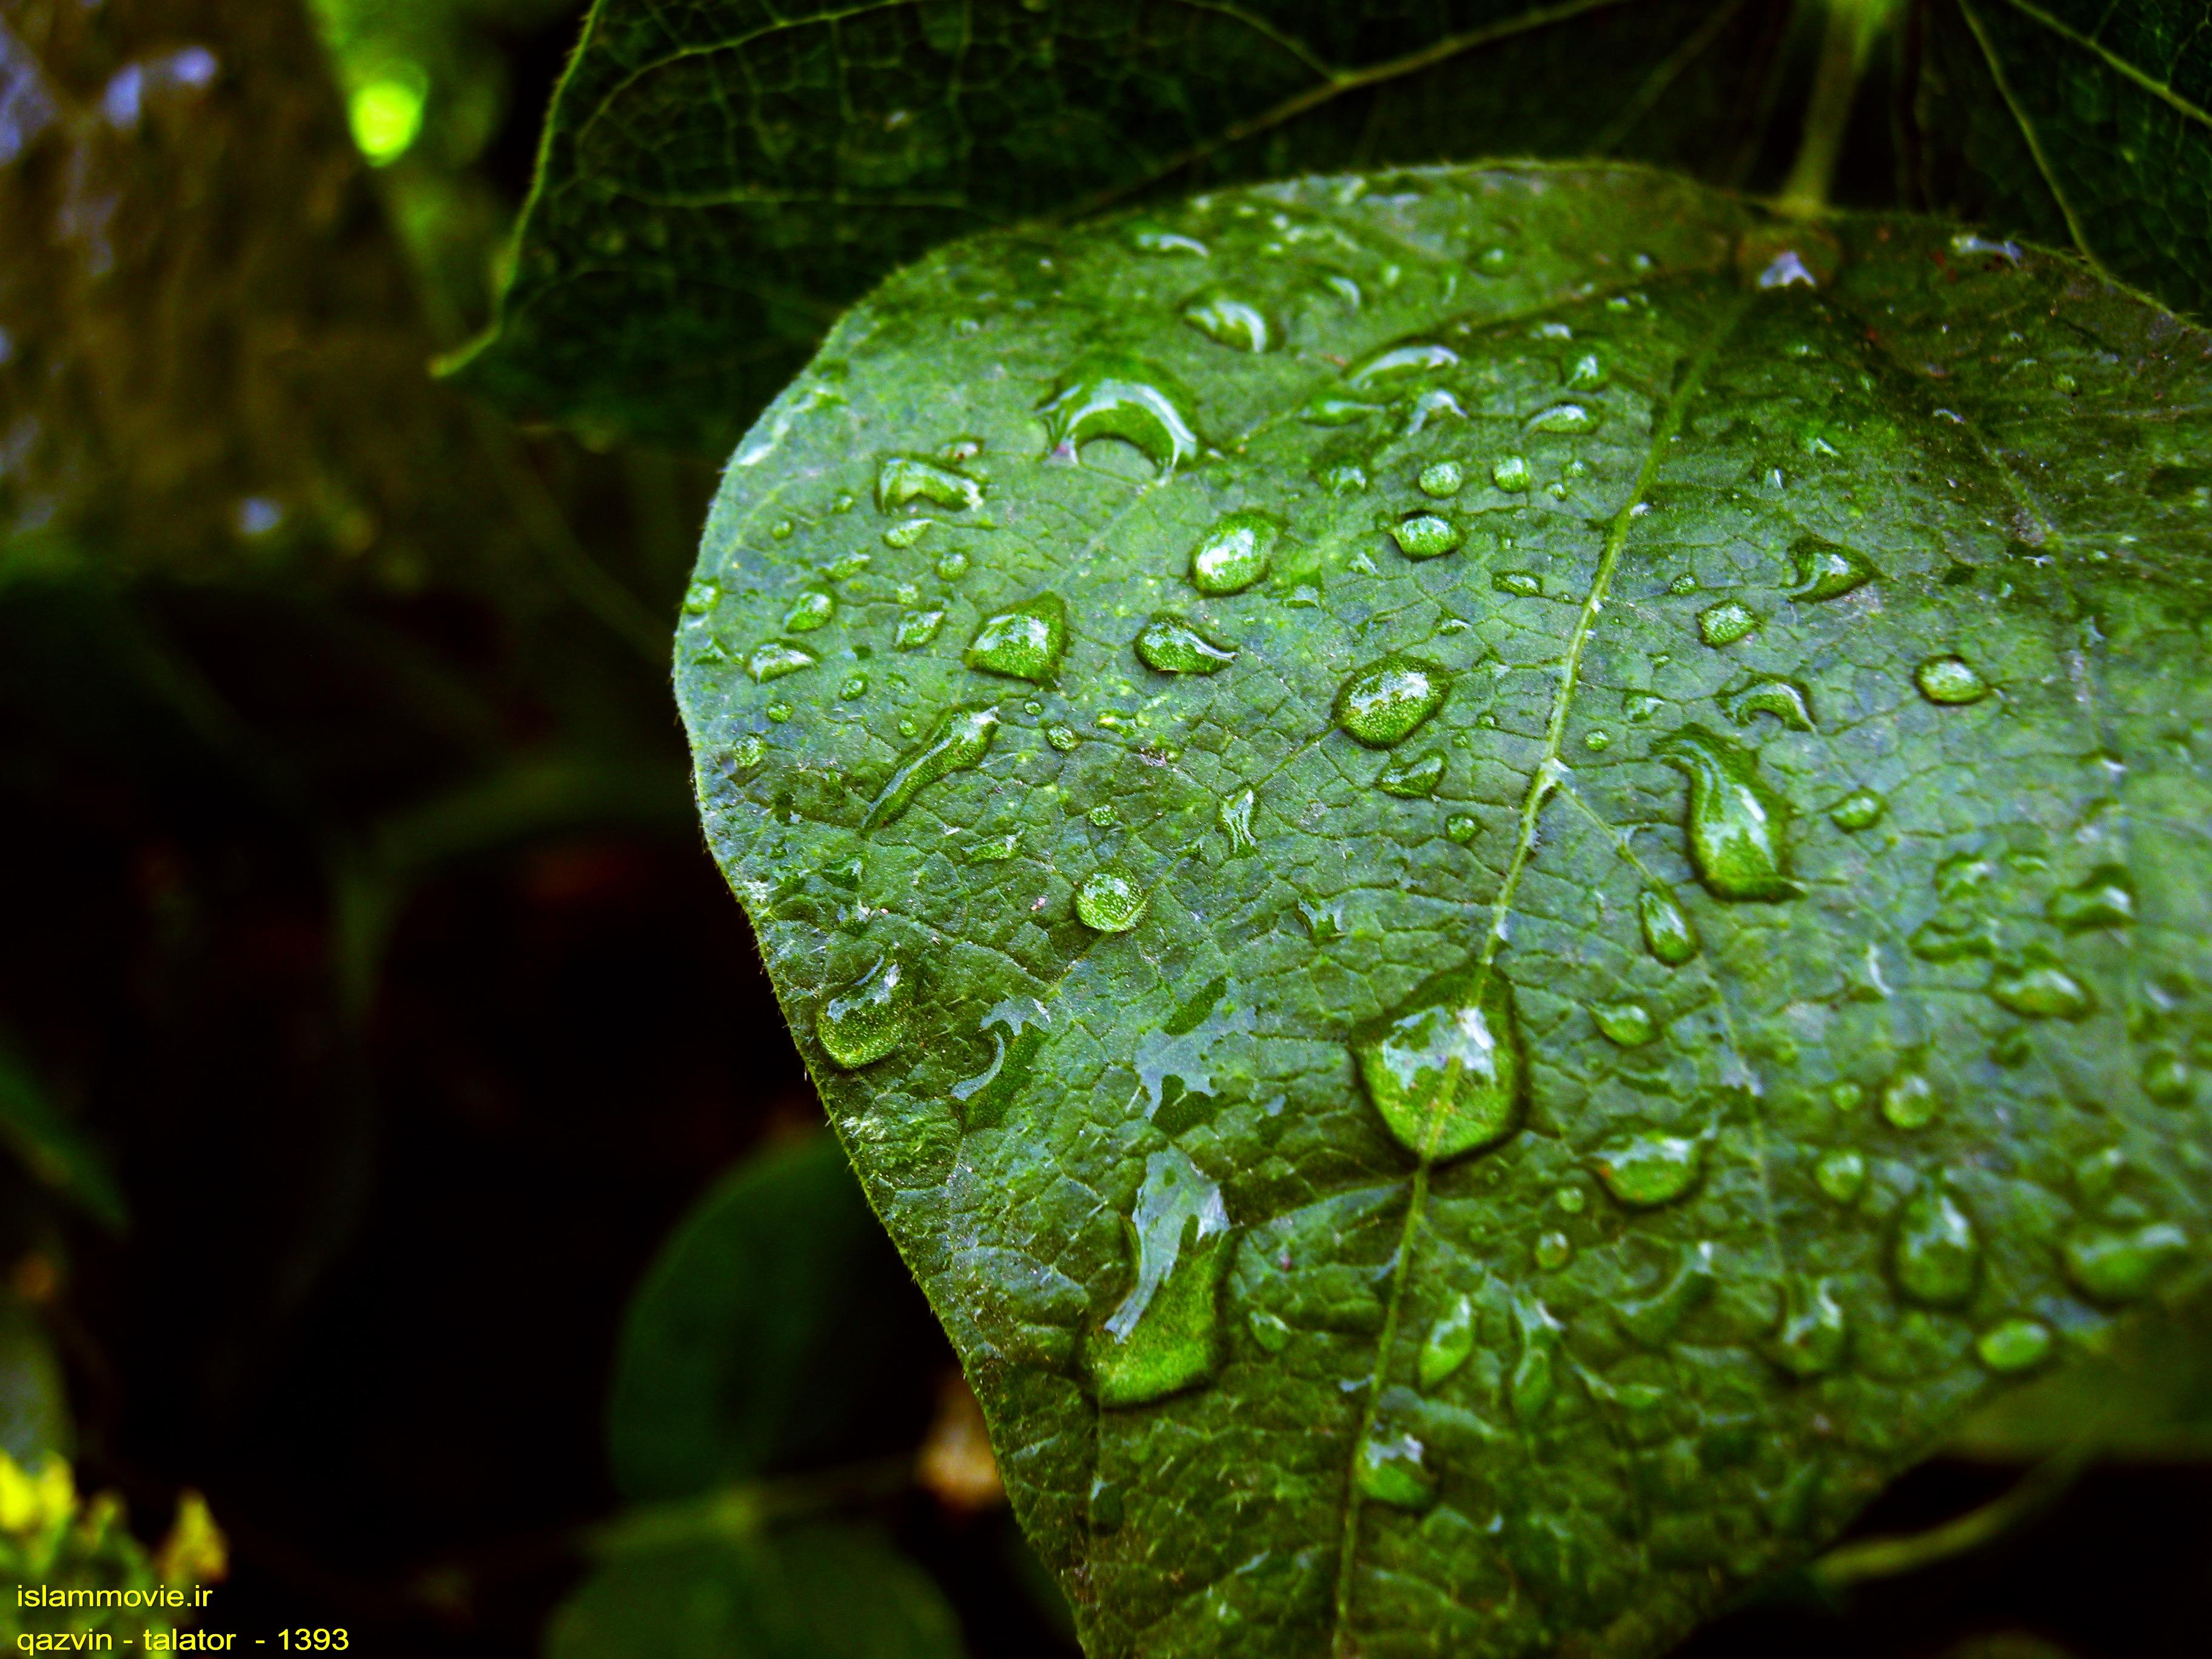 عکس های جالب طبیعت